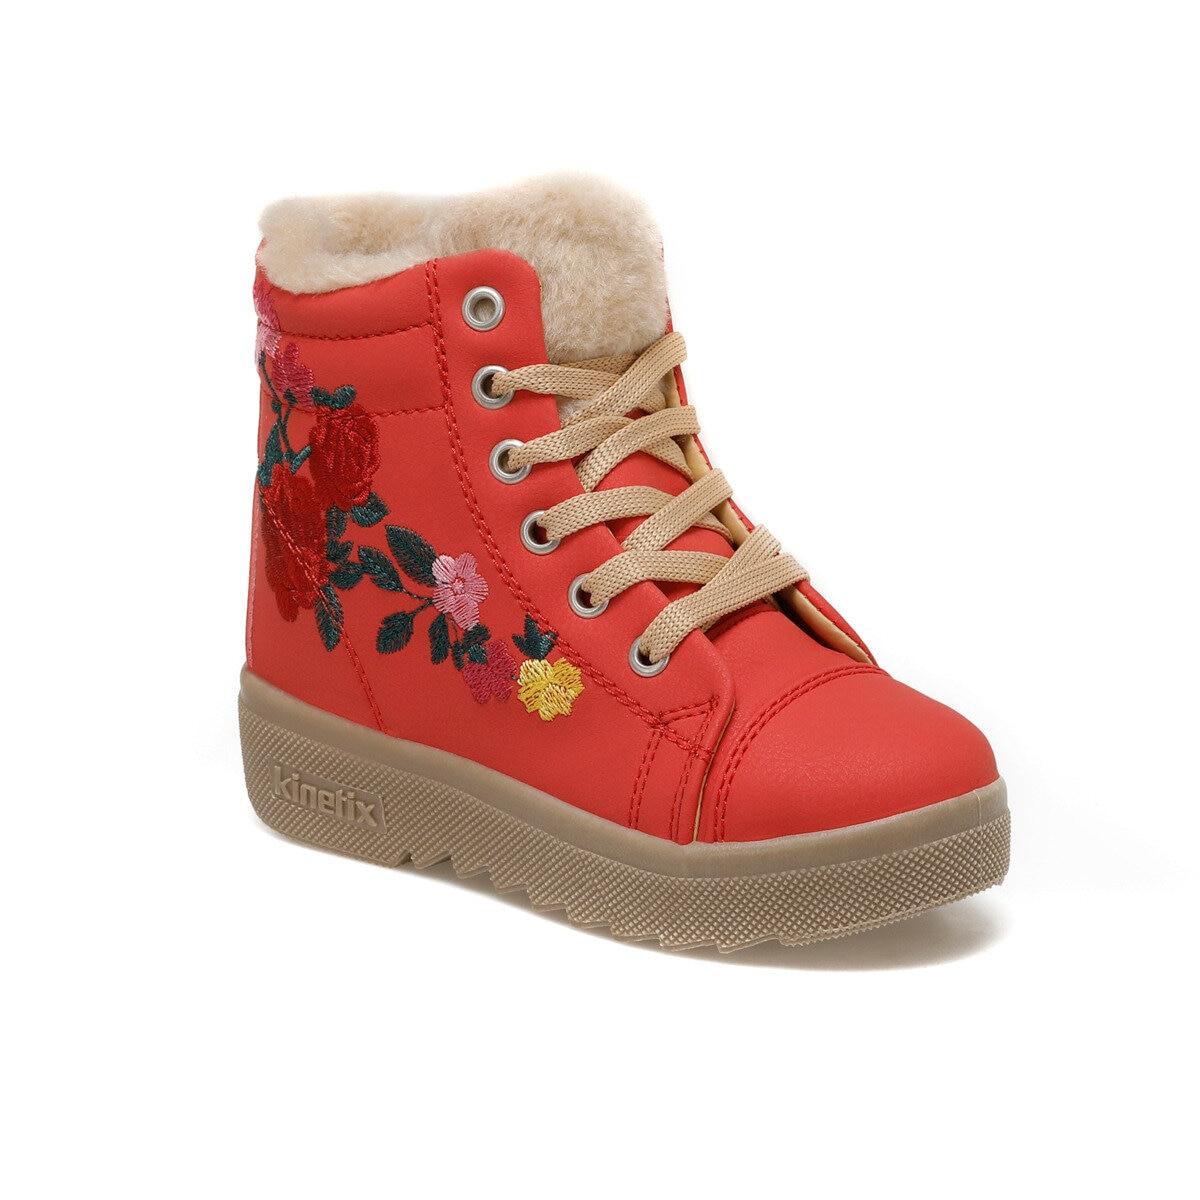 FLO SEVAY F Pomegranate Flower Female Child Boots KINETIX